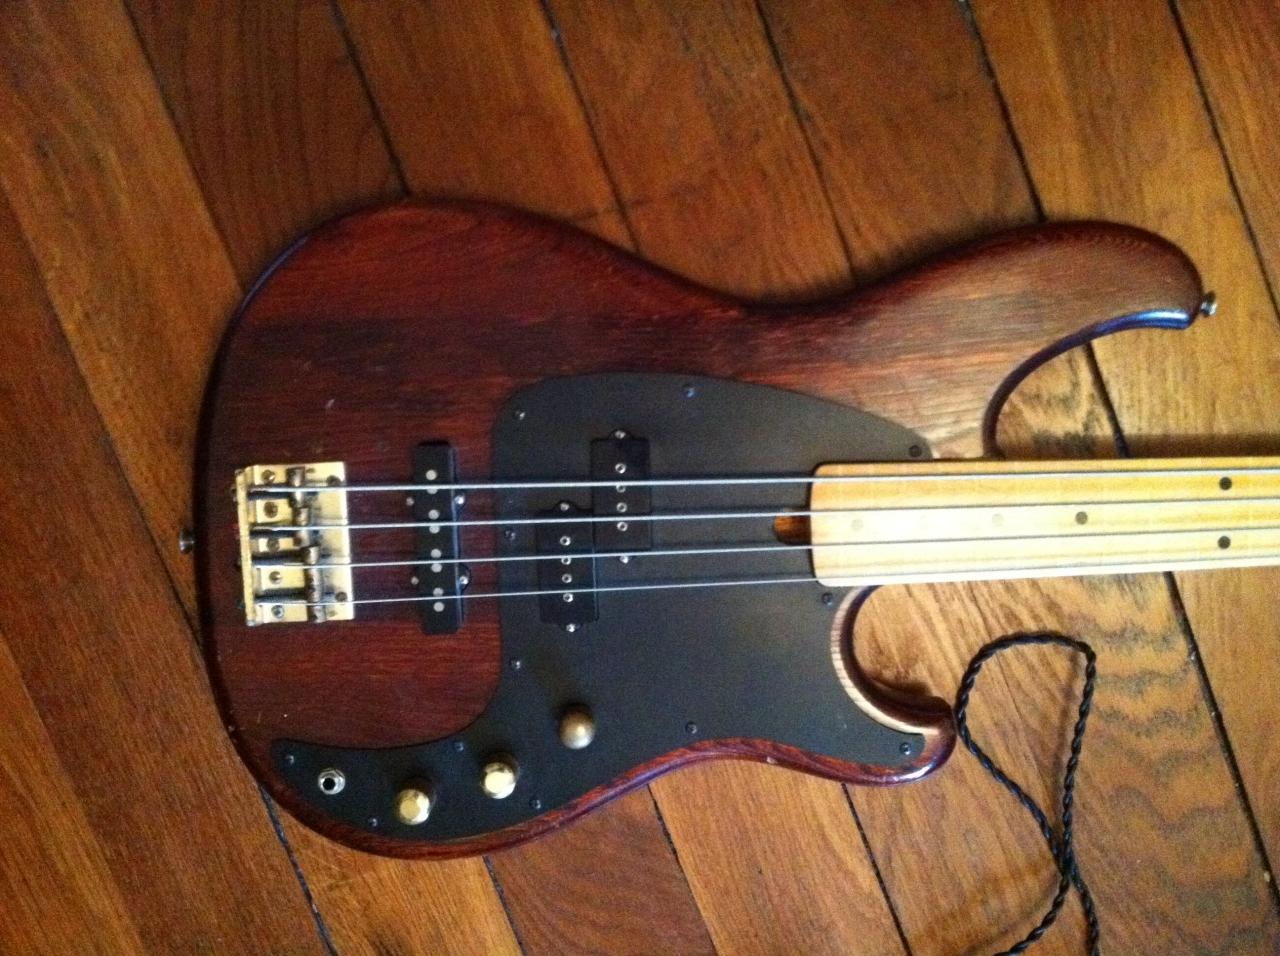 370e : Ibanez Blazer Custom Fretless Made in Japan 1981 [Petite Annonce de  Matos Bassistes : Vends Basse] | Slappyto